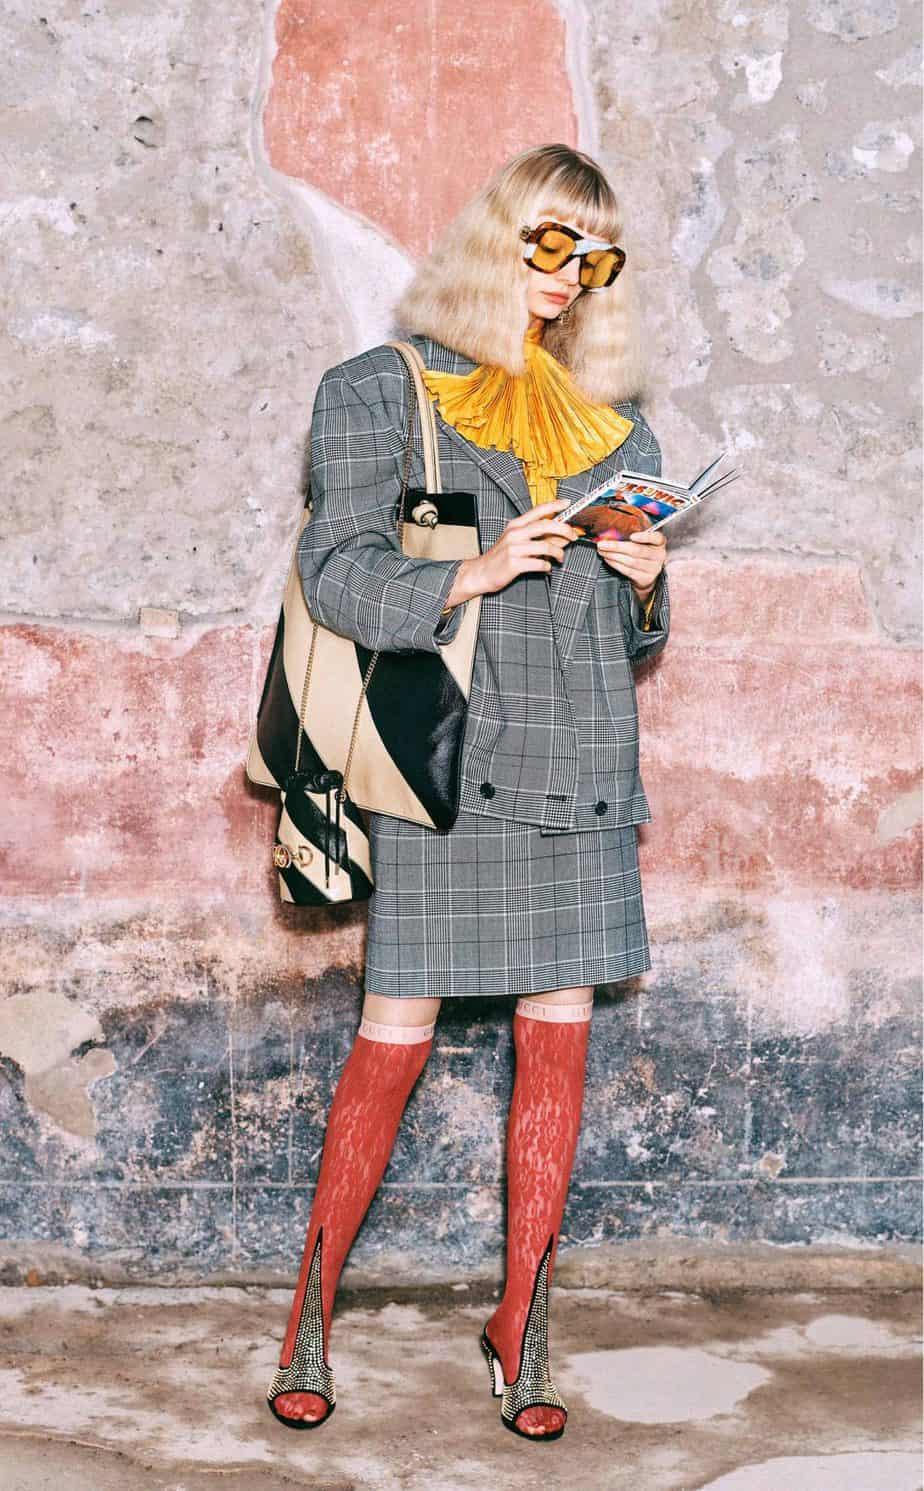 GUCCI, FALL 2019. WOMEN'S FASHION, Photographer Harmony Korine, Art Director, Christopher Simmonds - 42